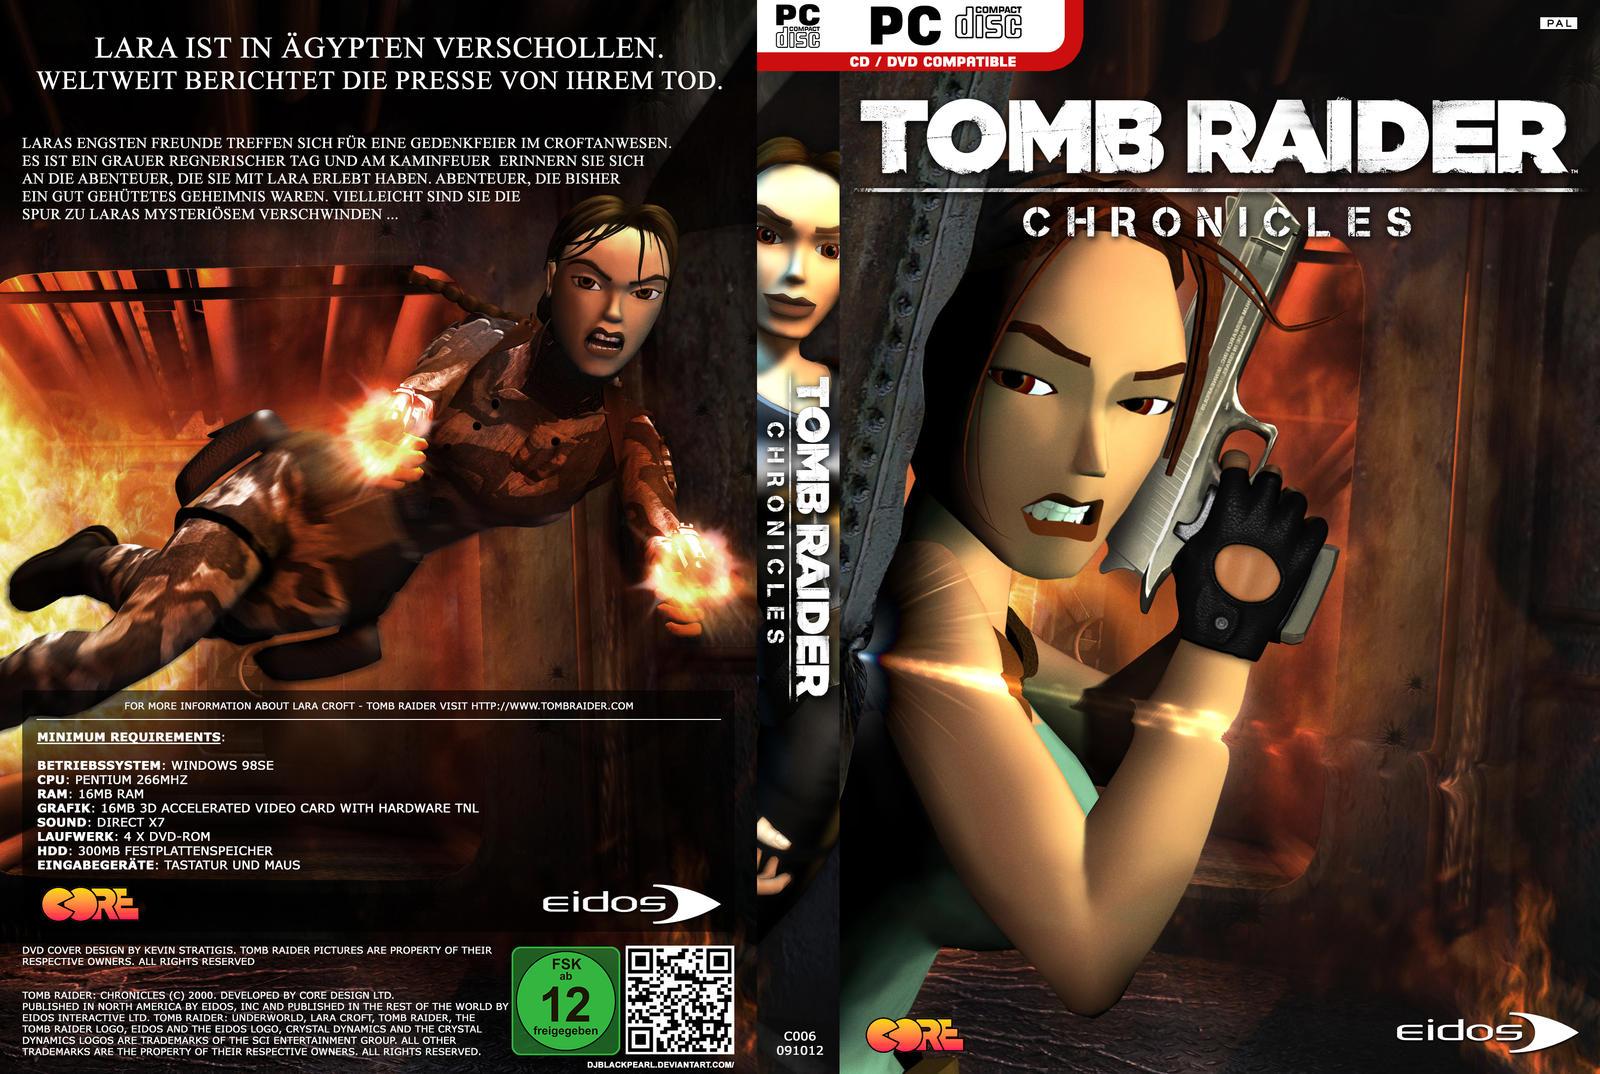 Tomb Raider: Chronicles - HQ Custom DVD Cover GER by ...  Tomb Raider: Ch...